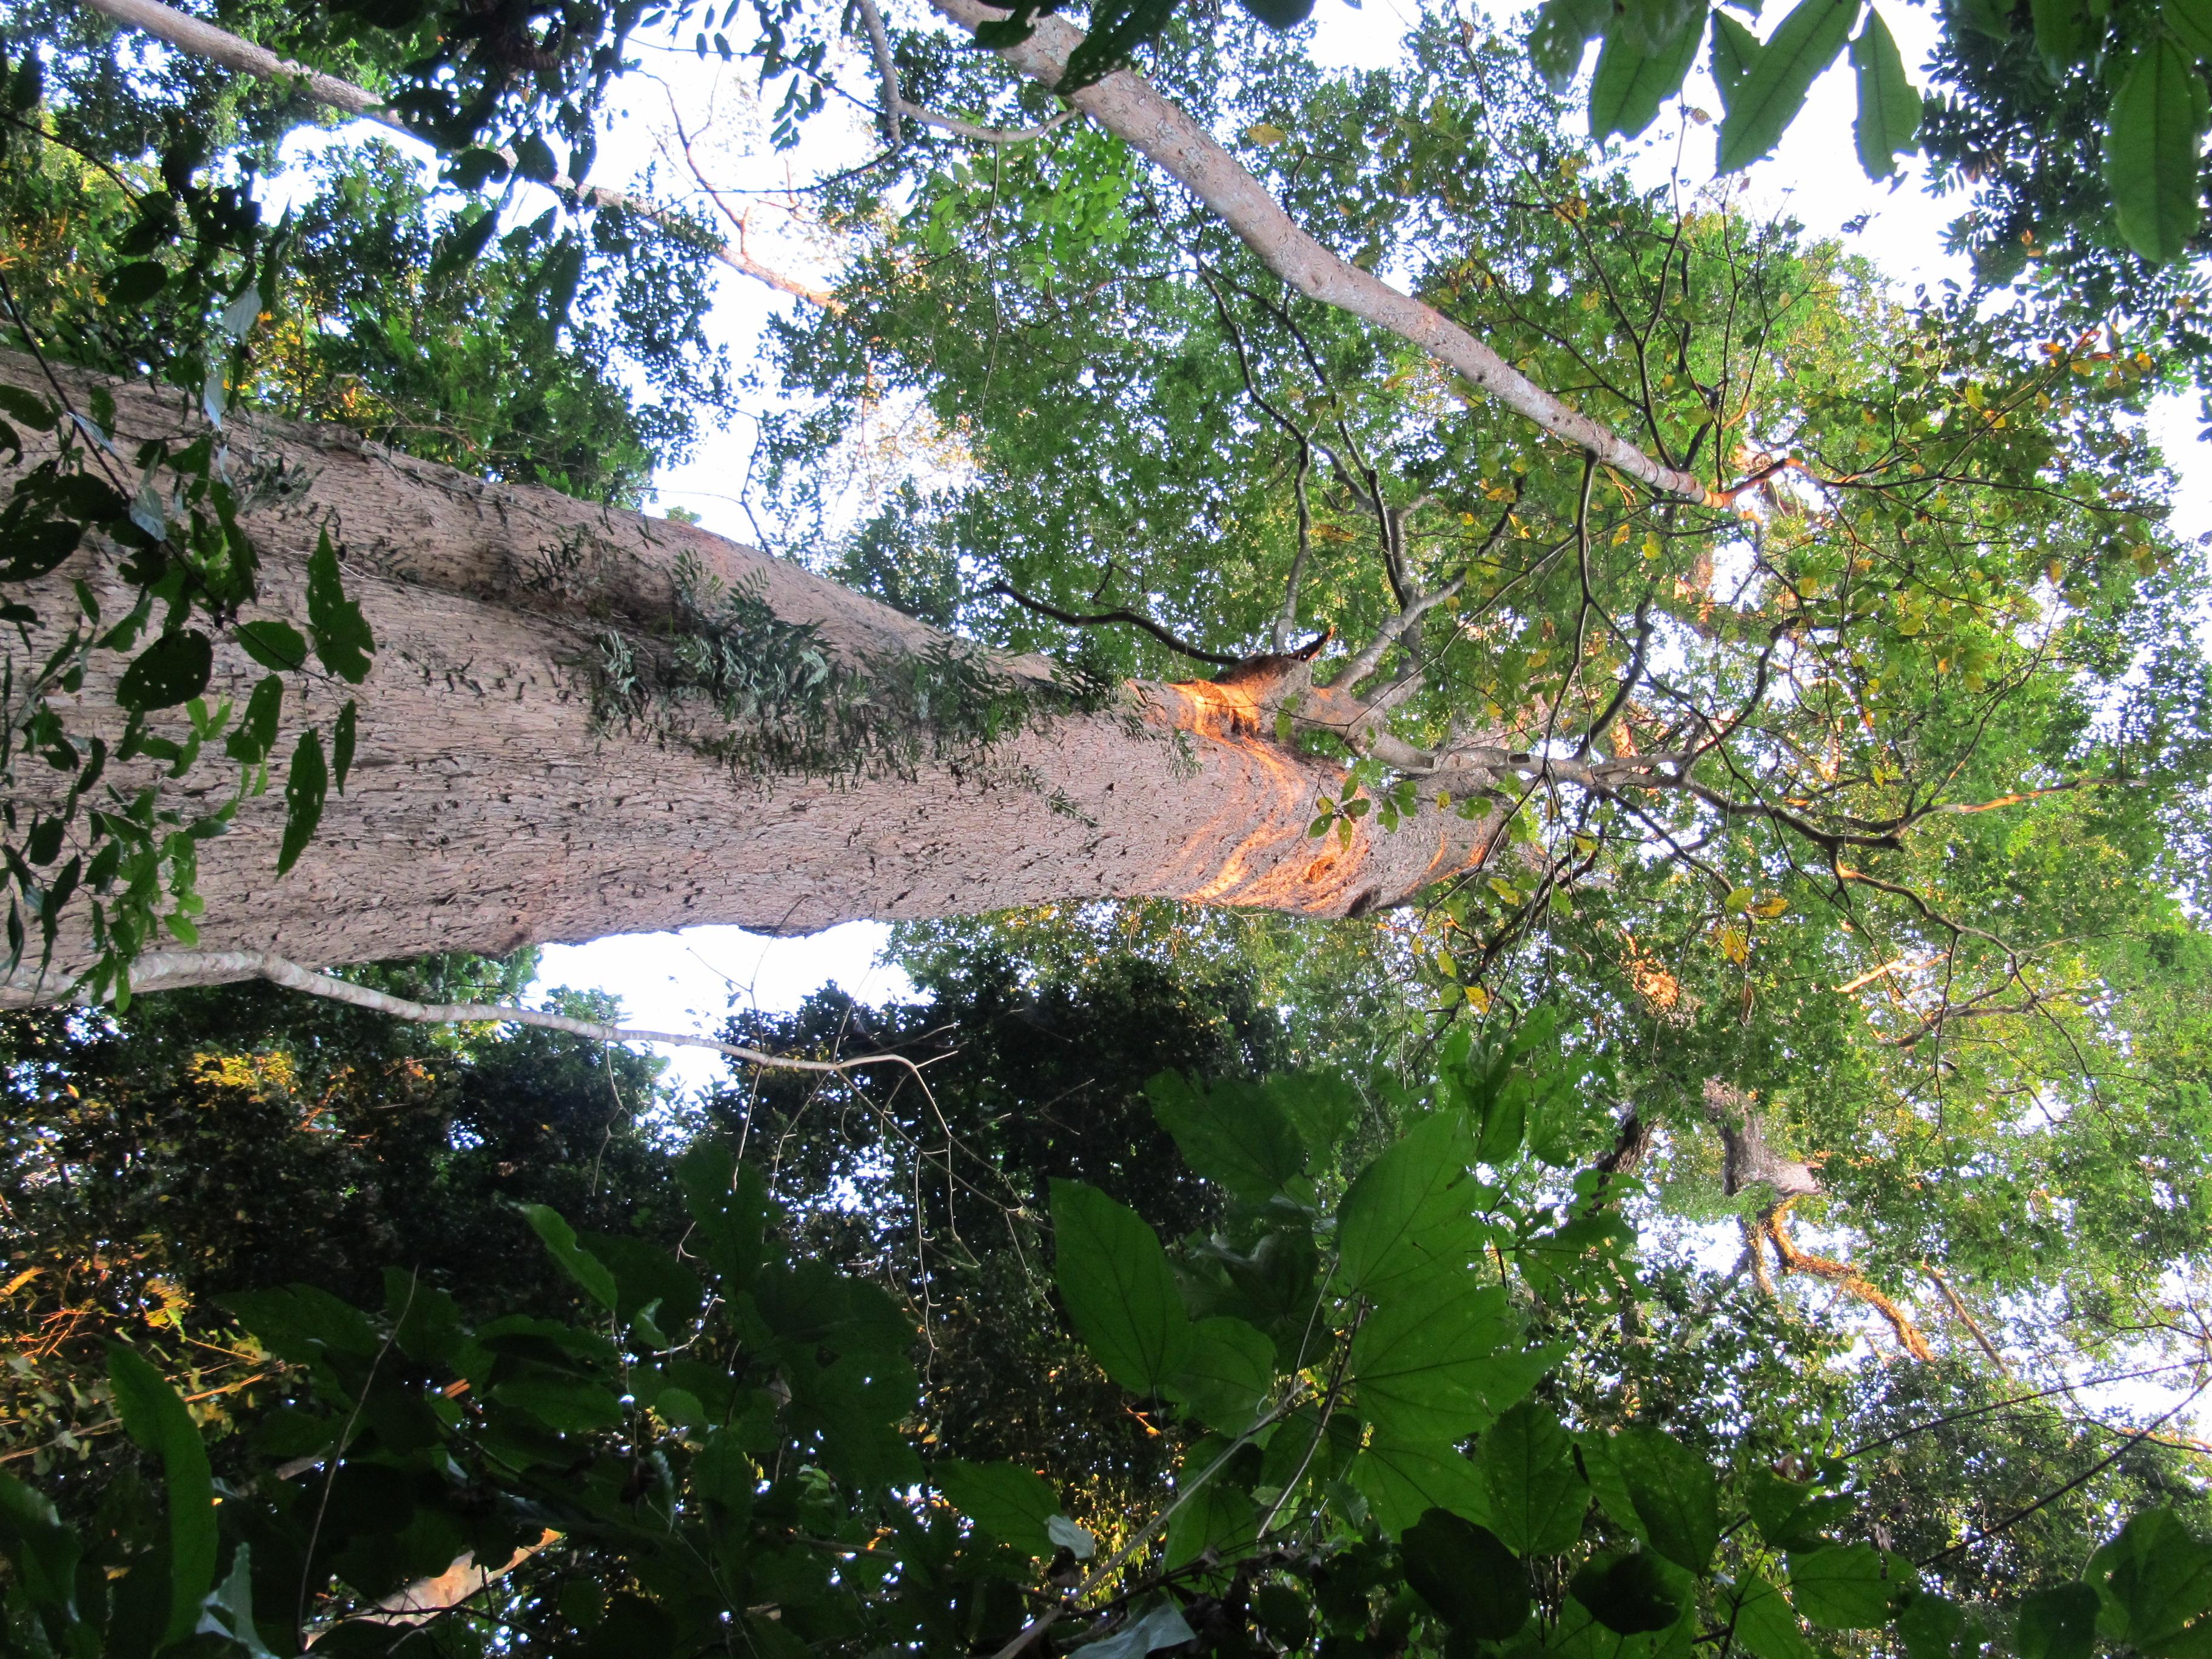 Терминалия Двукрылая, White Chuglam (Terminalia bialata)